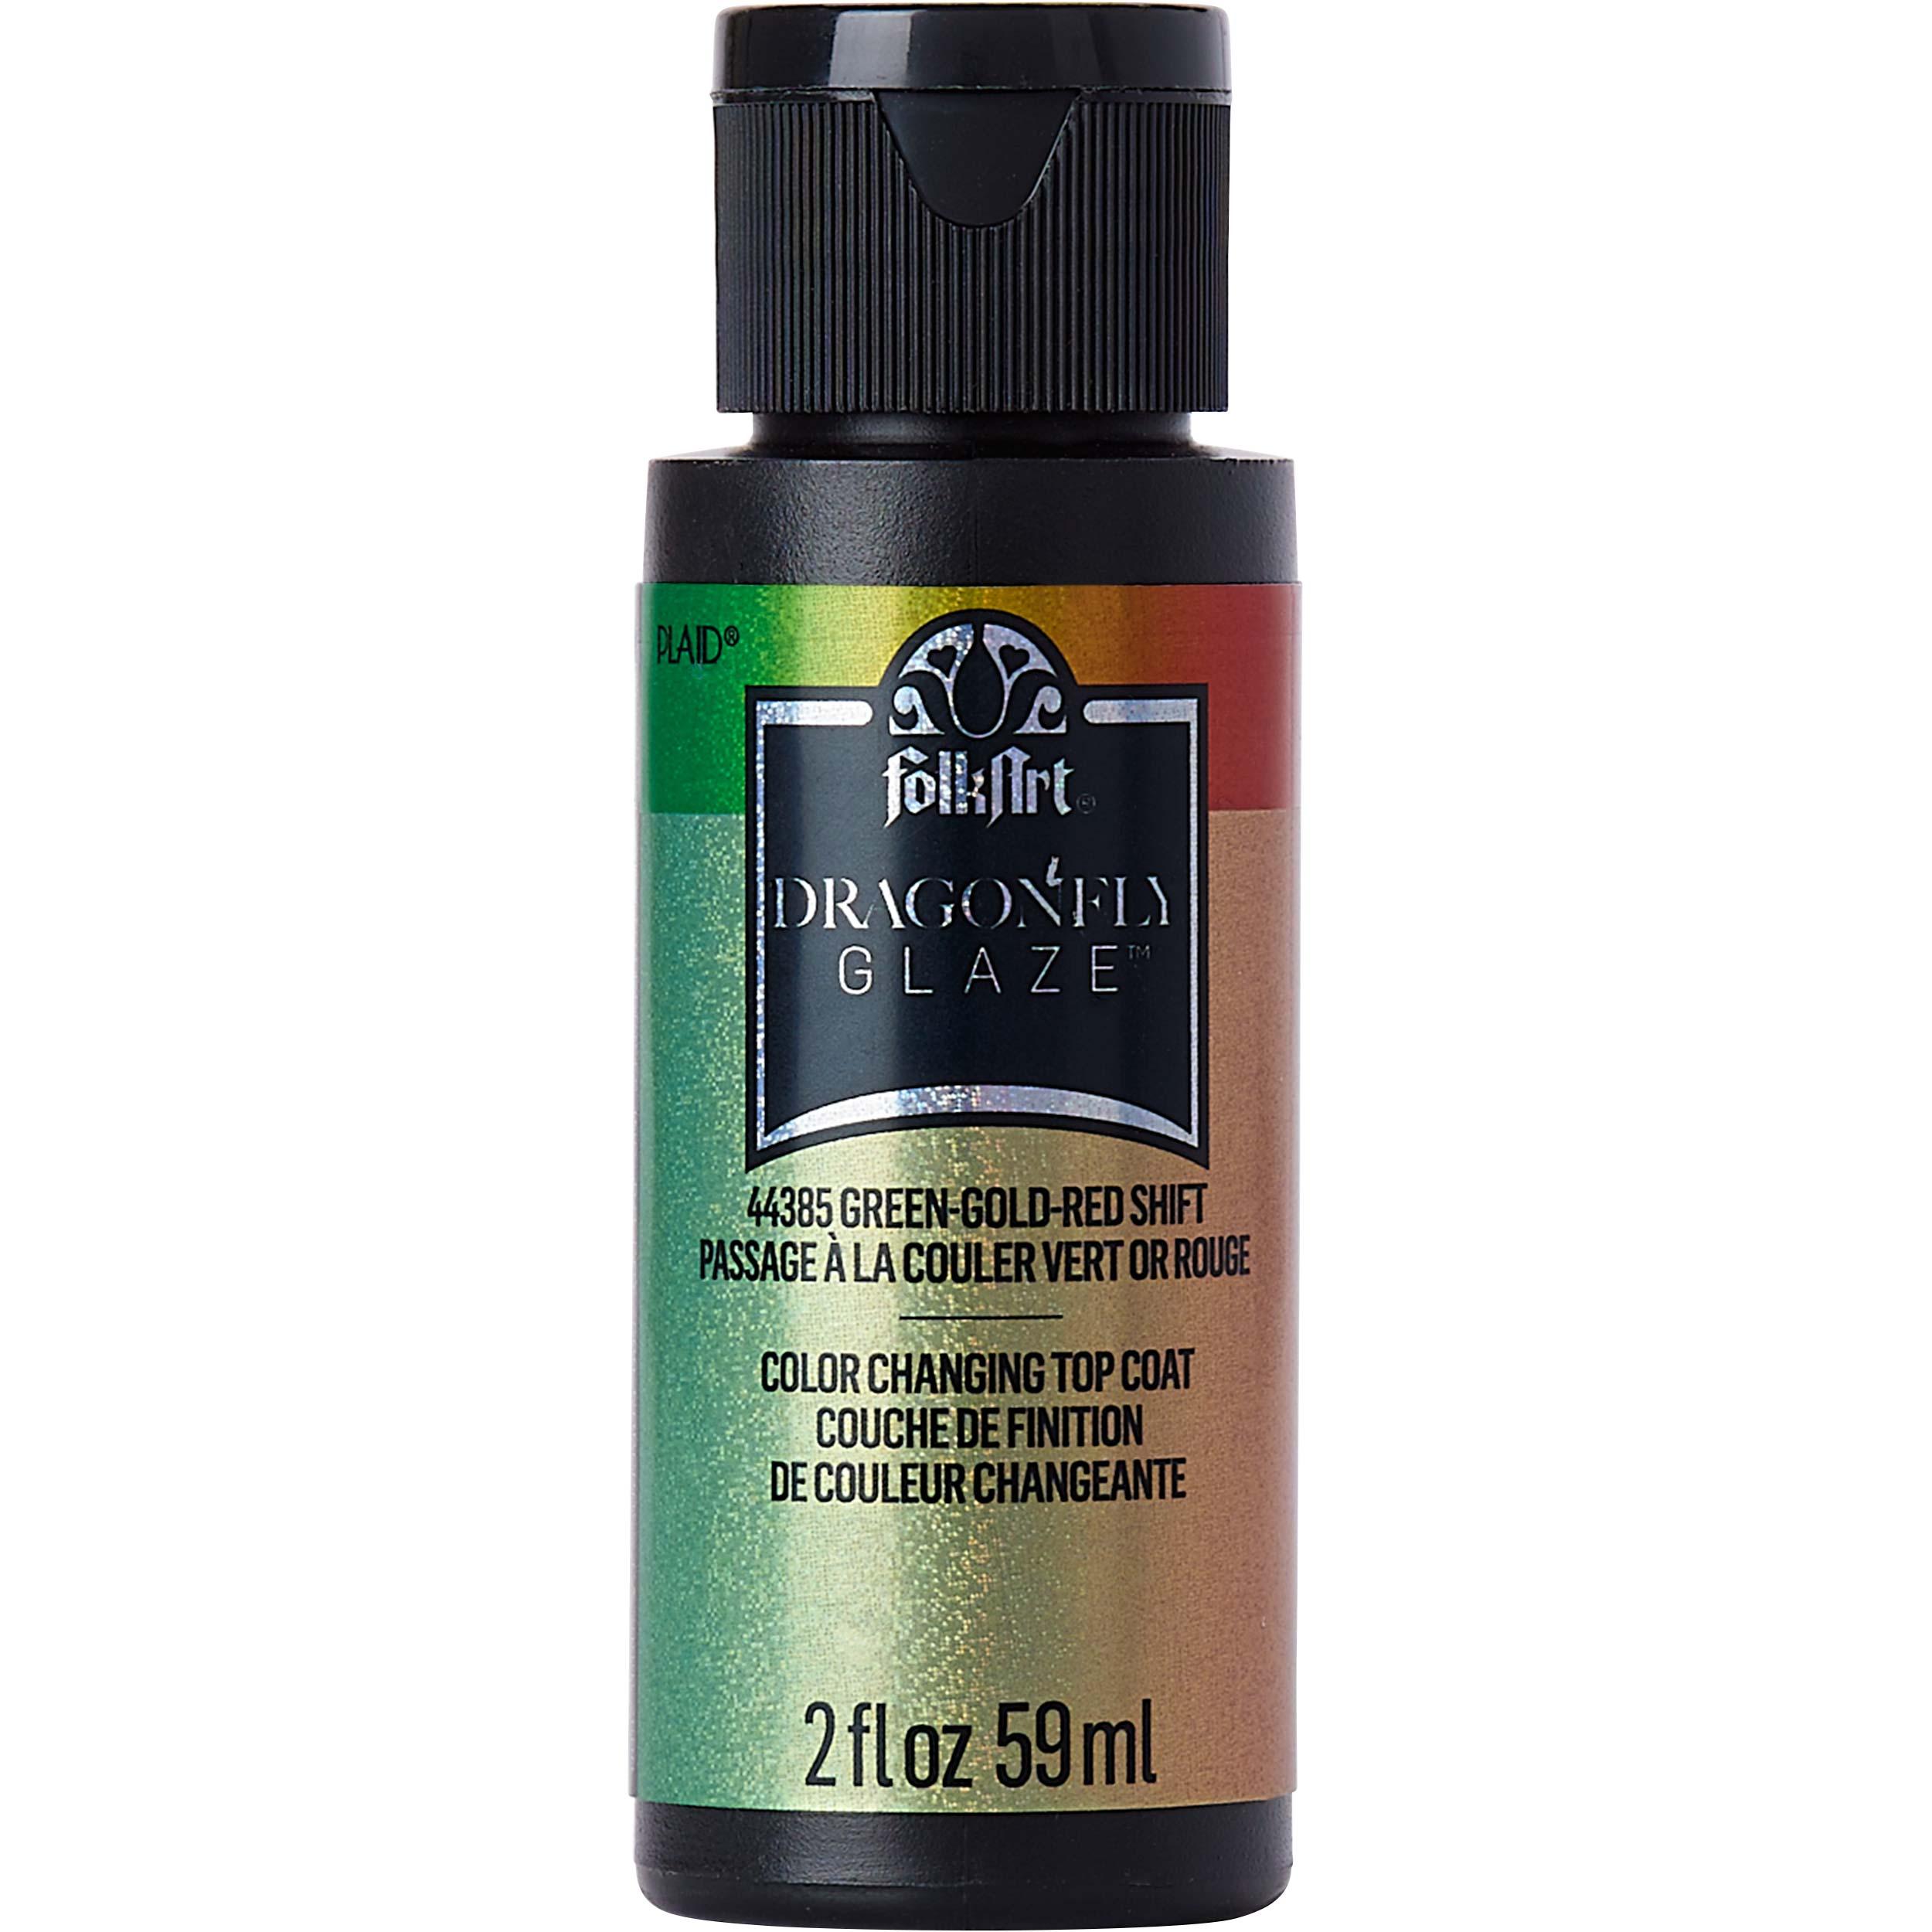 FolkArt ® Dragonfly Glaze™ - Green-Gold-Red, 2 oz.